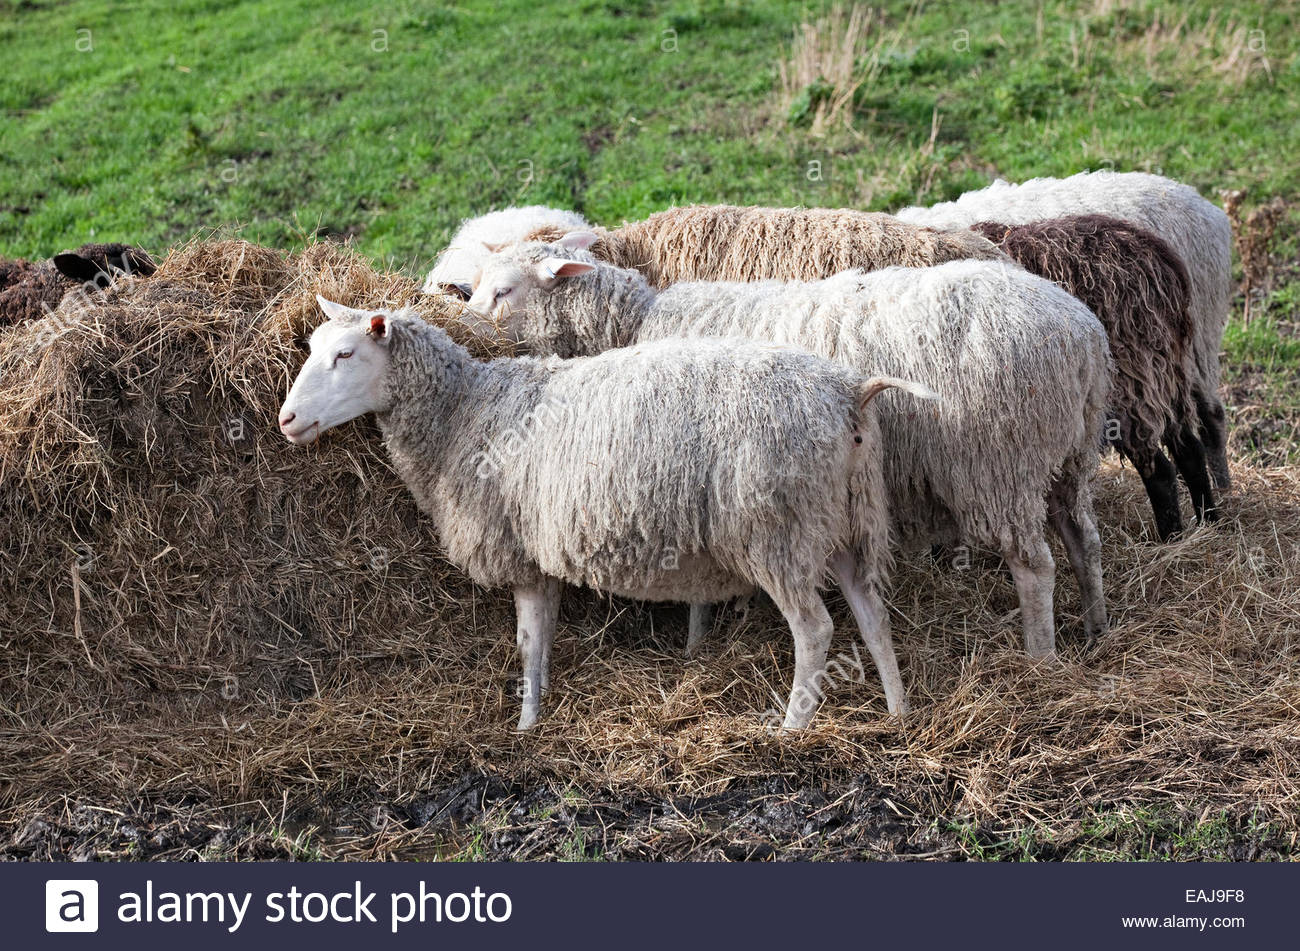 Feeding sheep in Finland - Stock Image